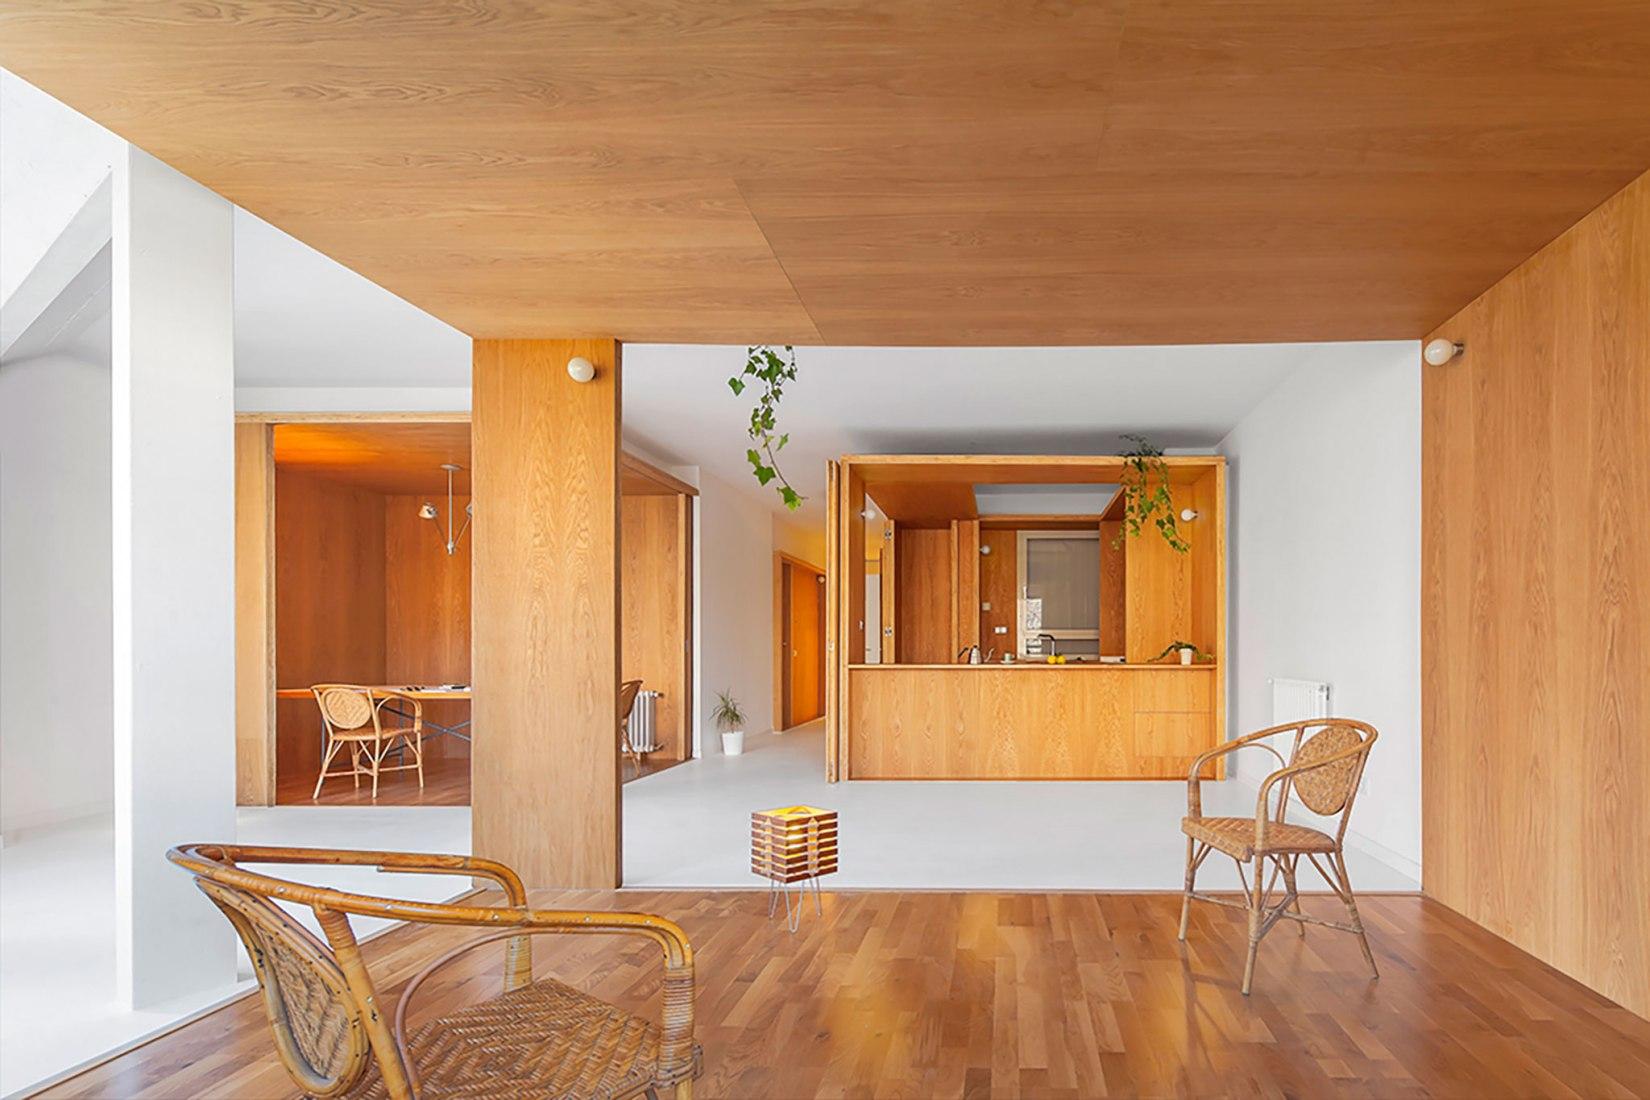 Apartamento extenso-intenso por Nil Brullet Francí. Fotografía por Andrés Flajszer.